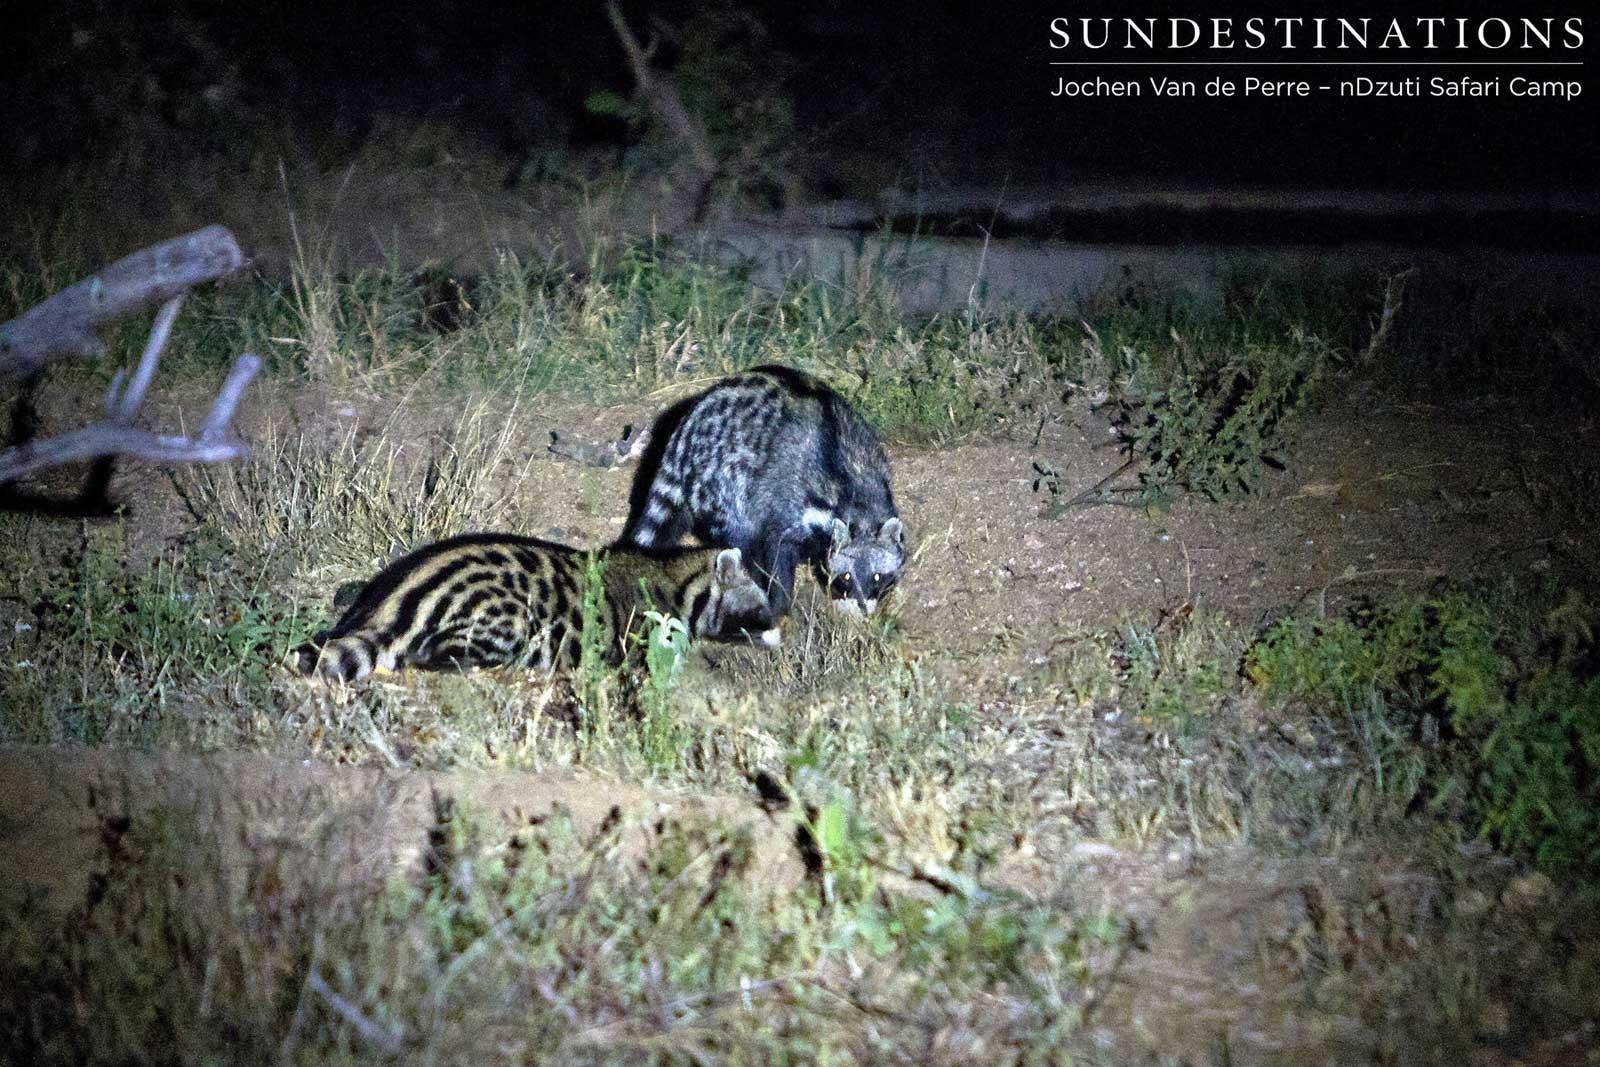 Nocturnal Animal Gathering at nDzuti Safari Camp